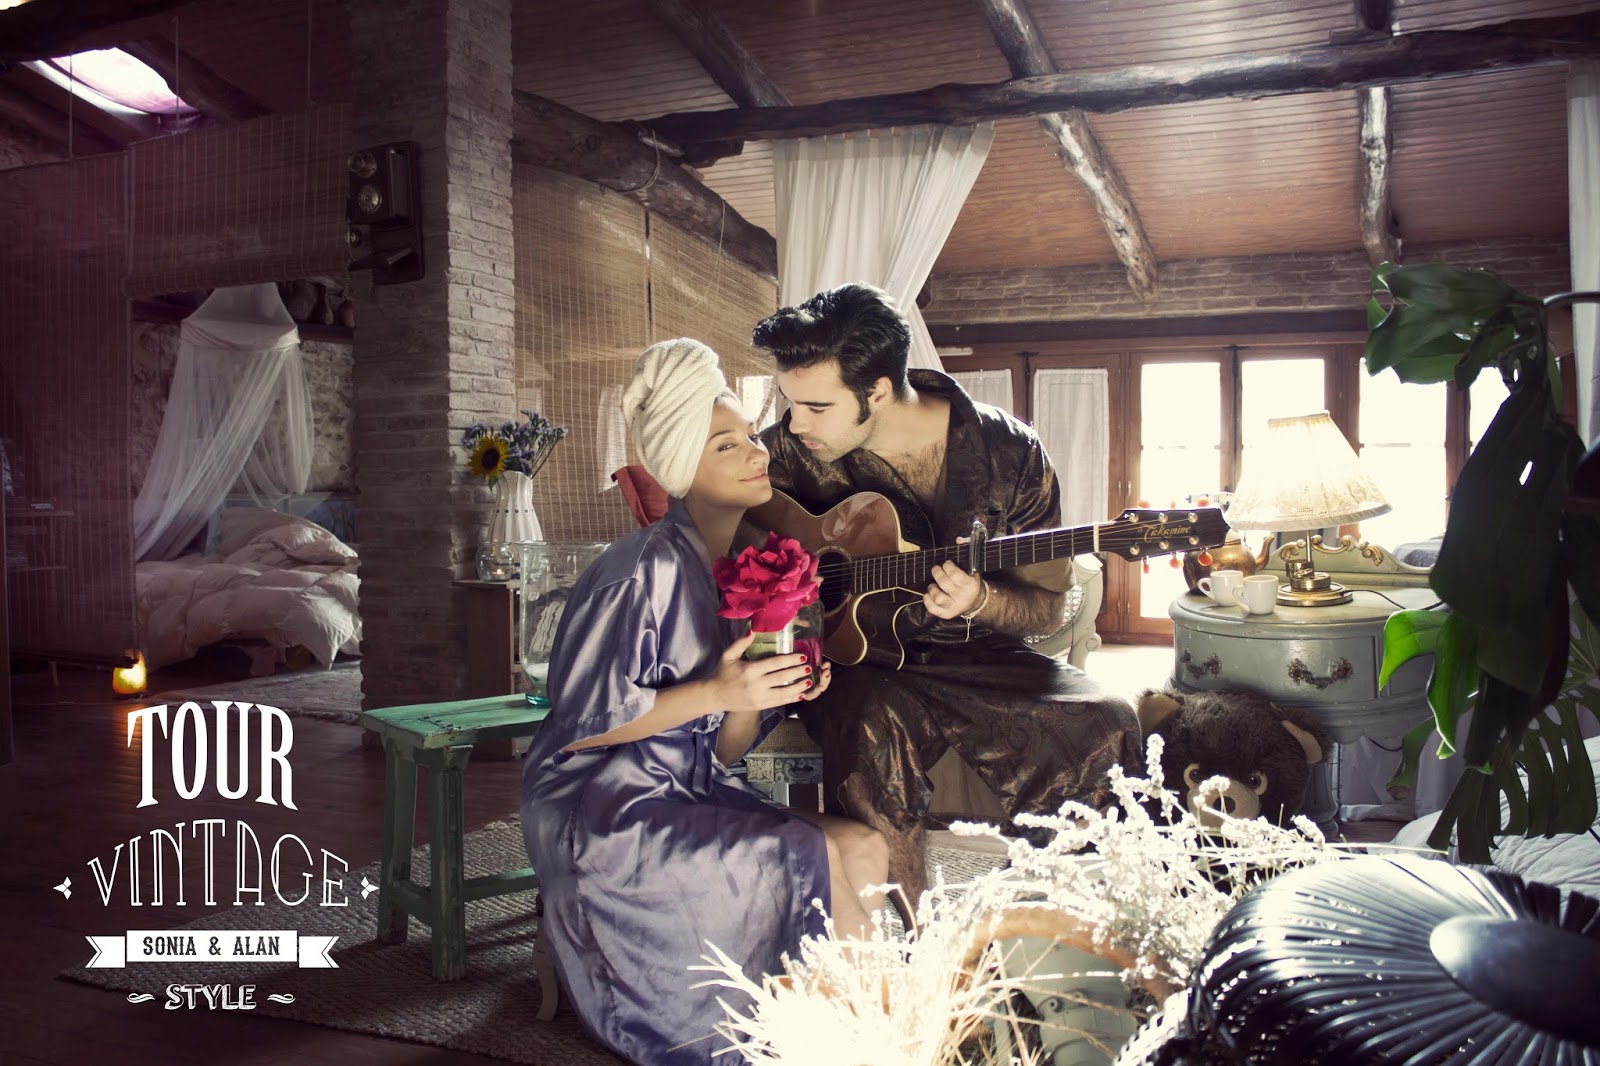 Casa rural la pintora Requena. Alan Blesa y Sonia Soler. tourvintage.blogspot.com